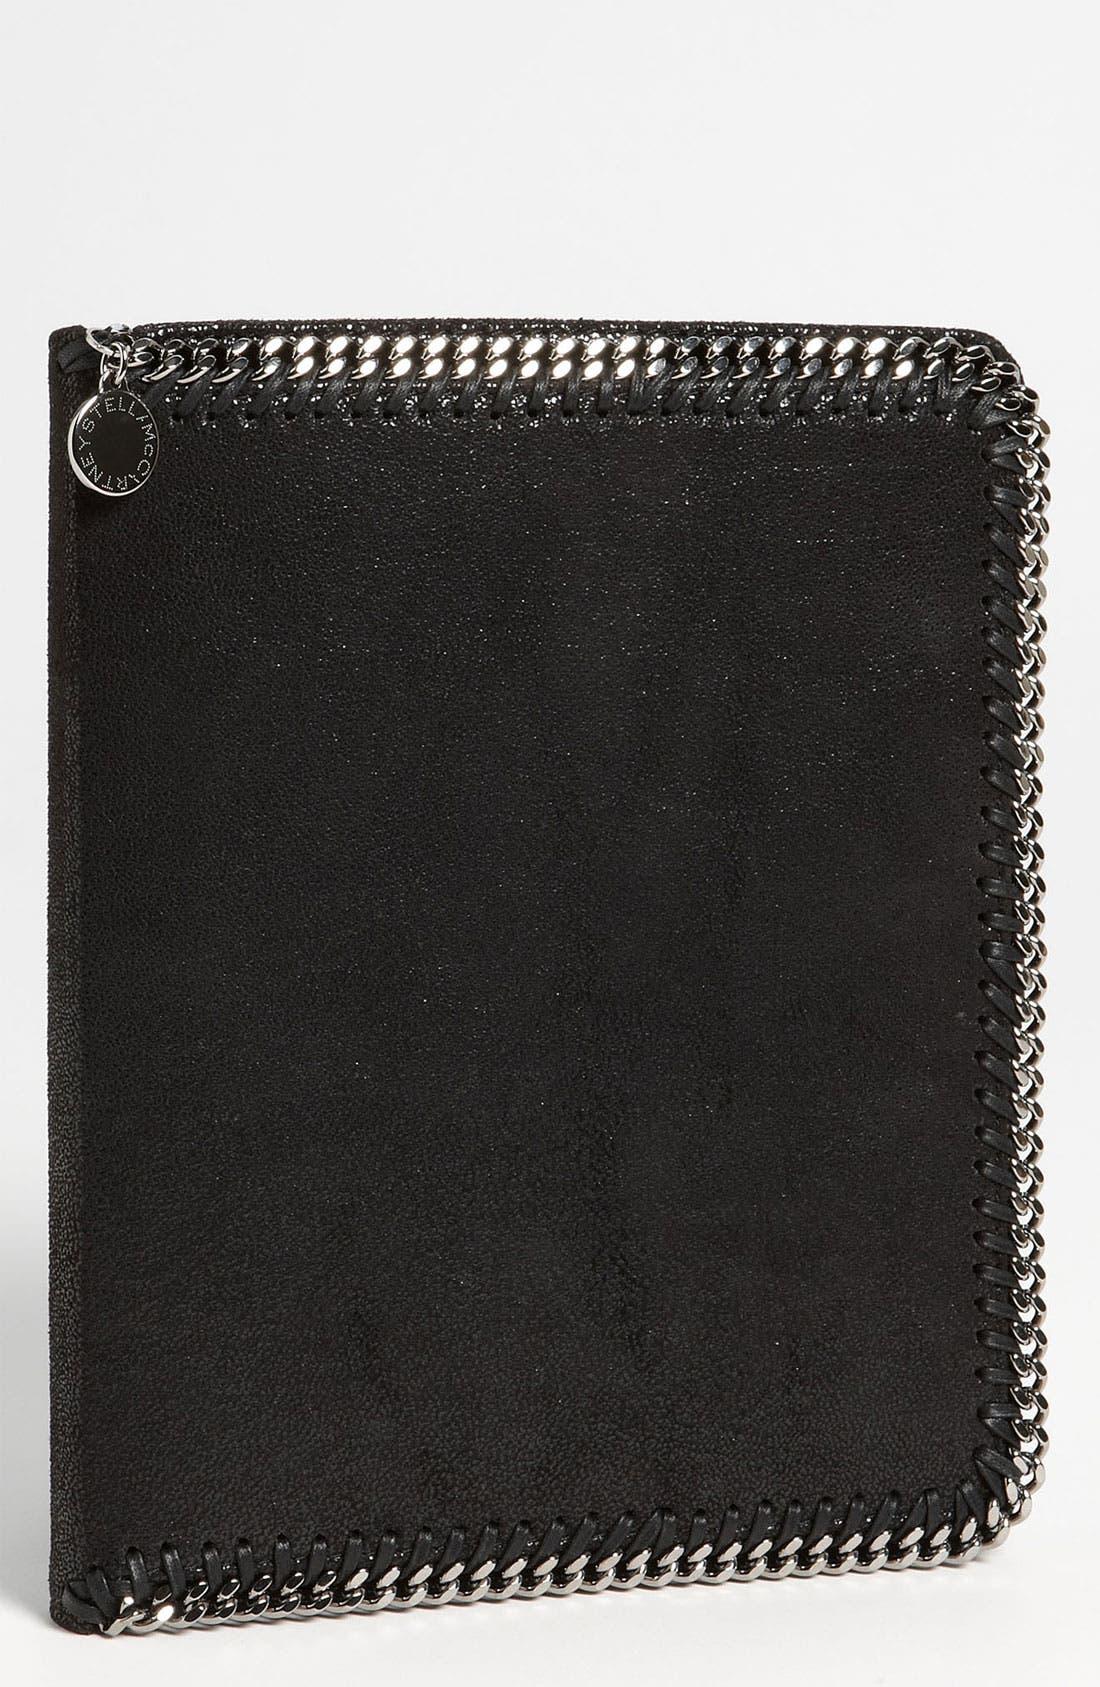 Alternate Image 1 Selected - Stella McCartney 'Falabella' iPad Case